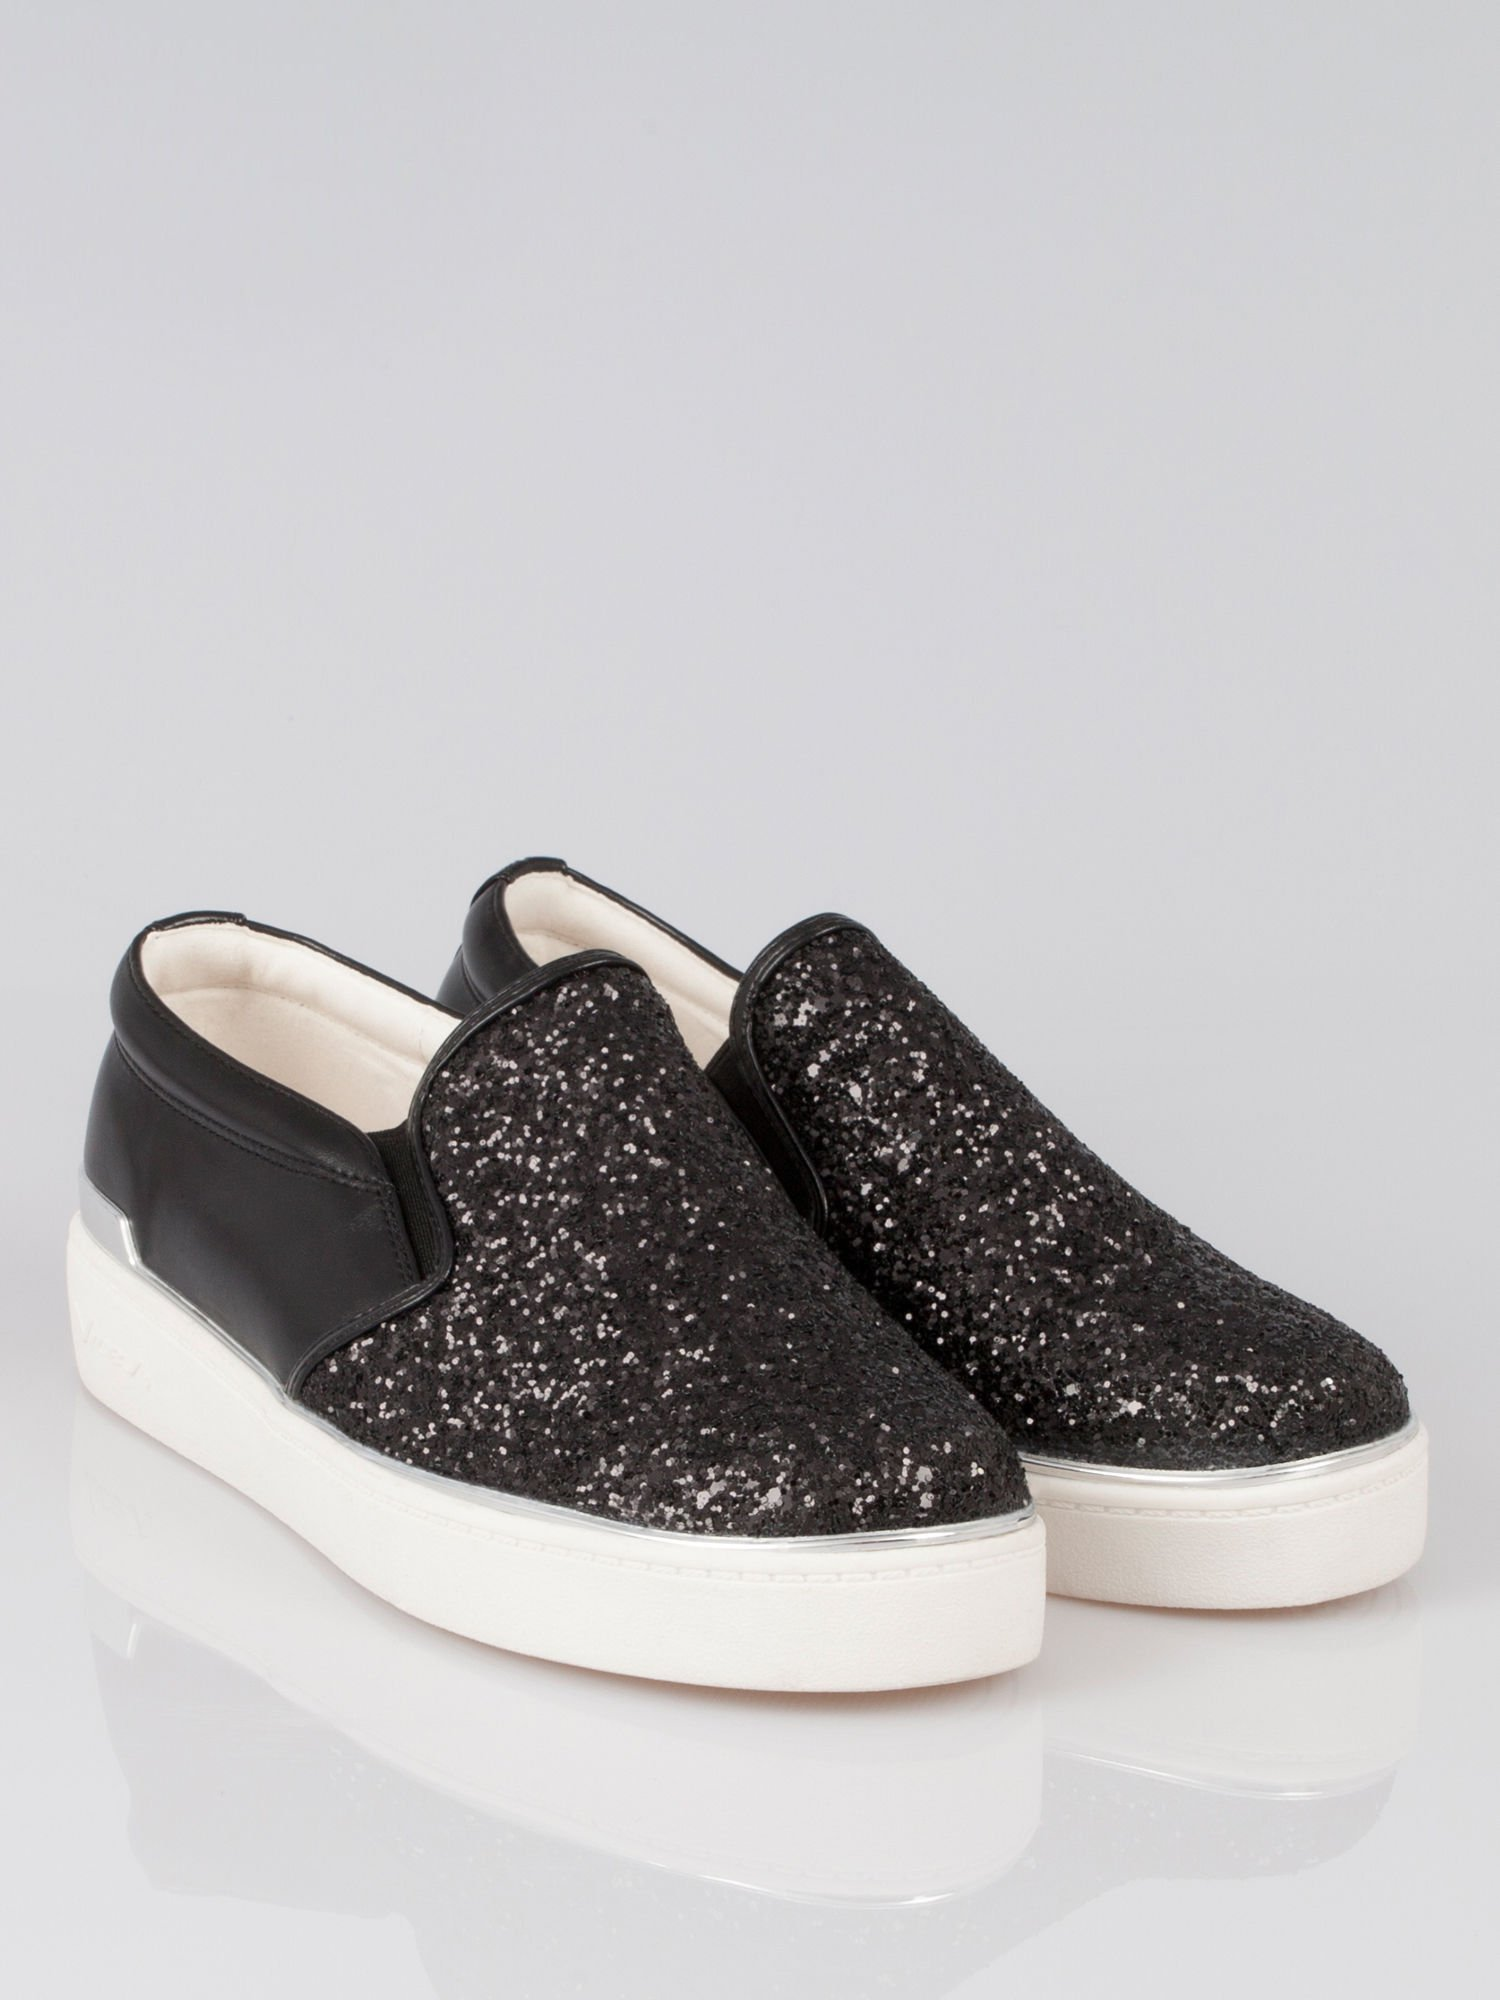 Czarne buty sliponki glitter                                  zdj.                                  1